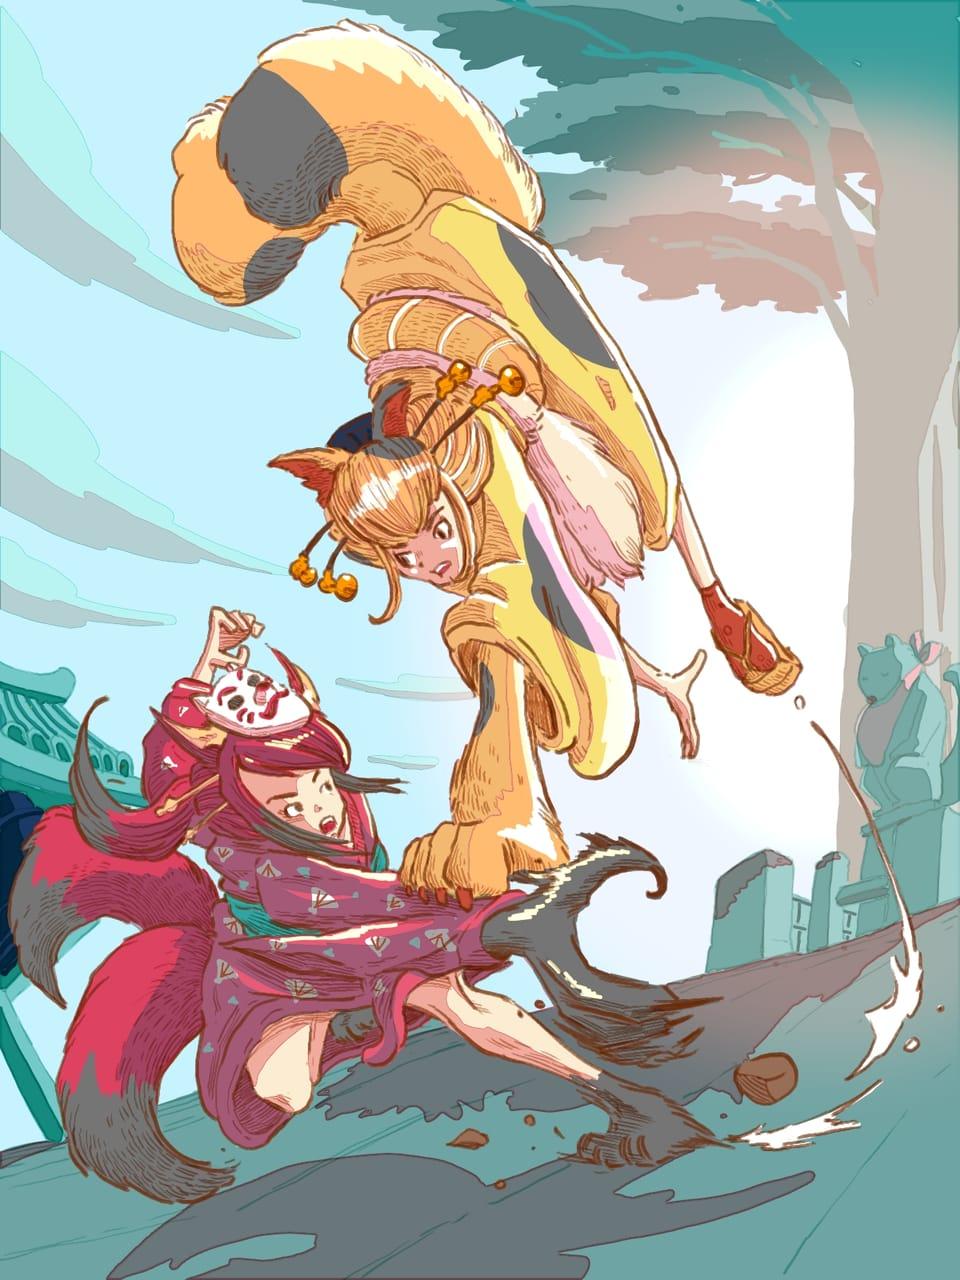 Fighting of cat demon and fox demon Illust of Wutikai action January2021_Contest:OC February2021_Fantasy youkai scenery demon oc girl cat Japanese_style fight kimono